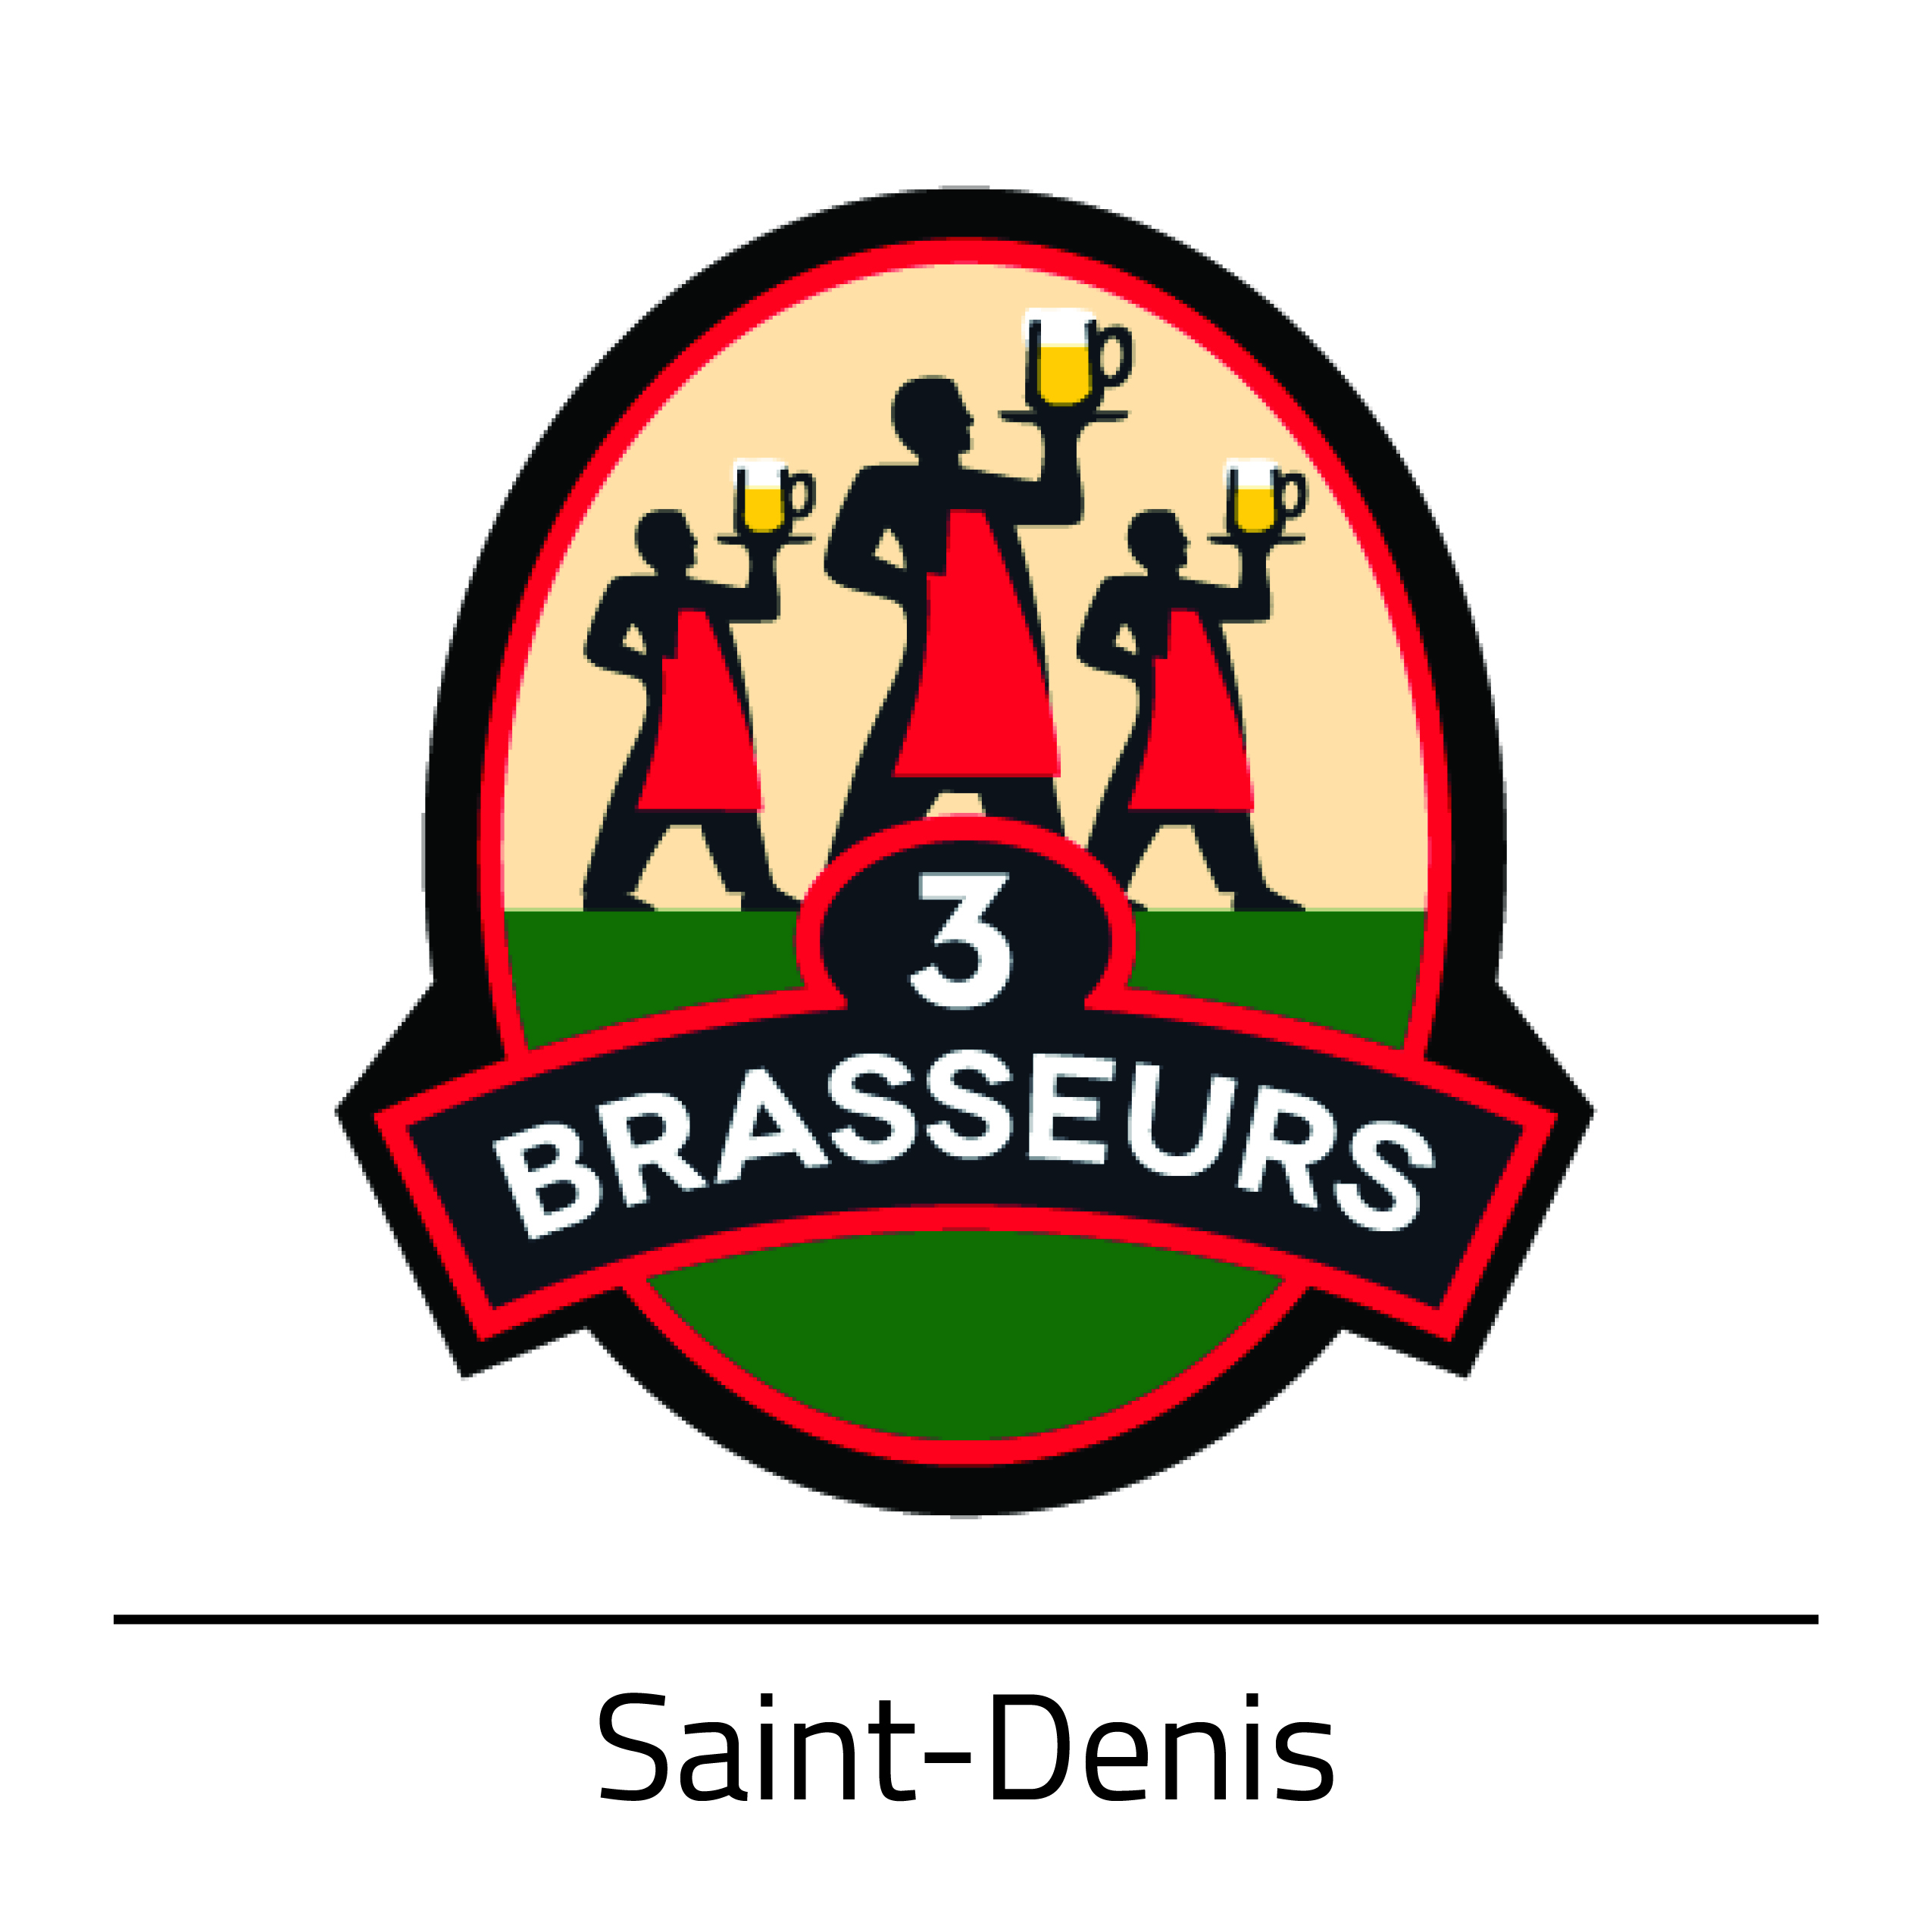 3 Brasseurs Saint-Denis